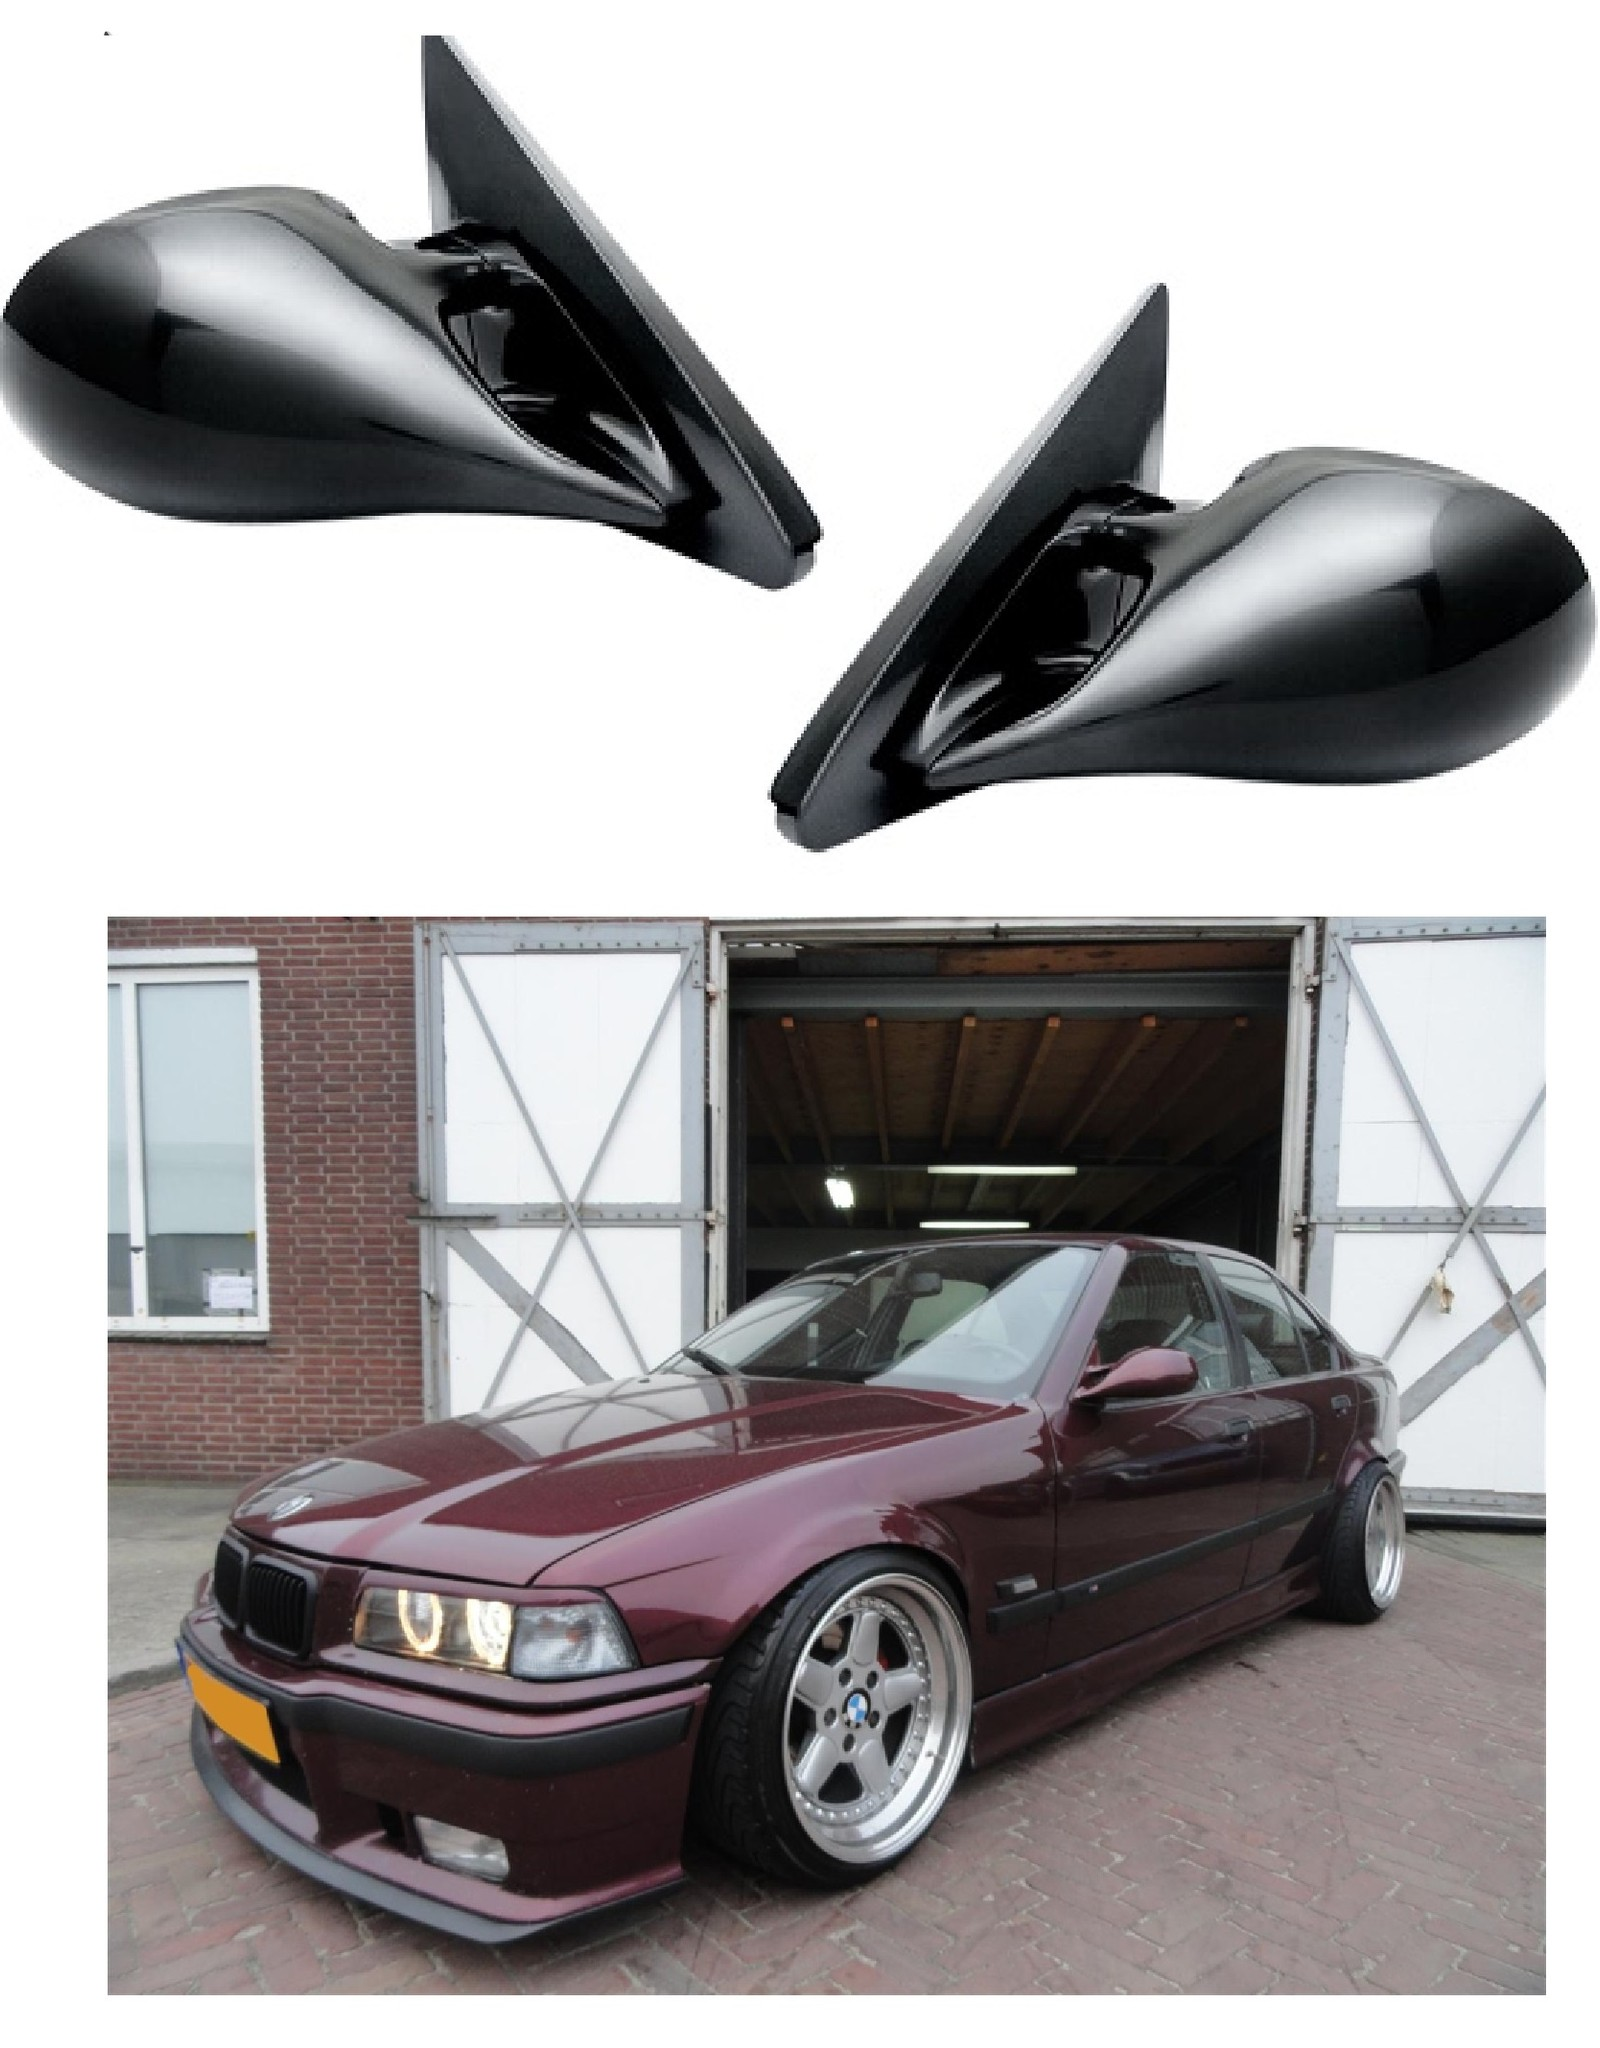 Elektrische sportspiegels voor BMW E36 sedan en touring